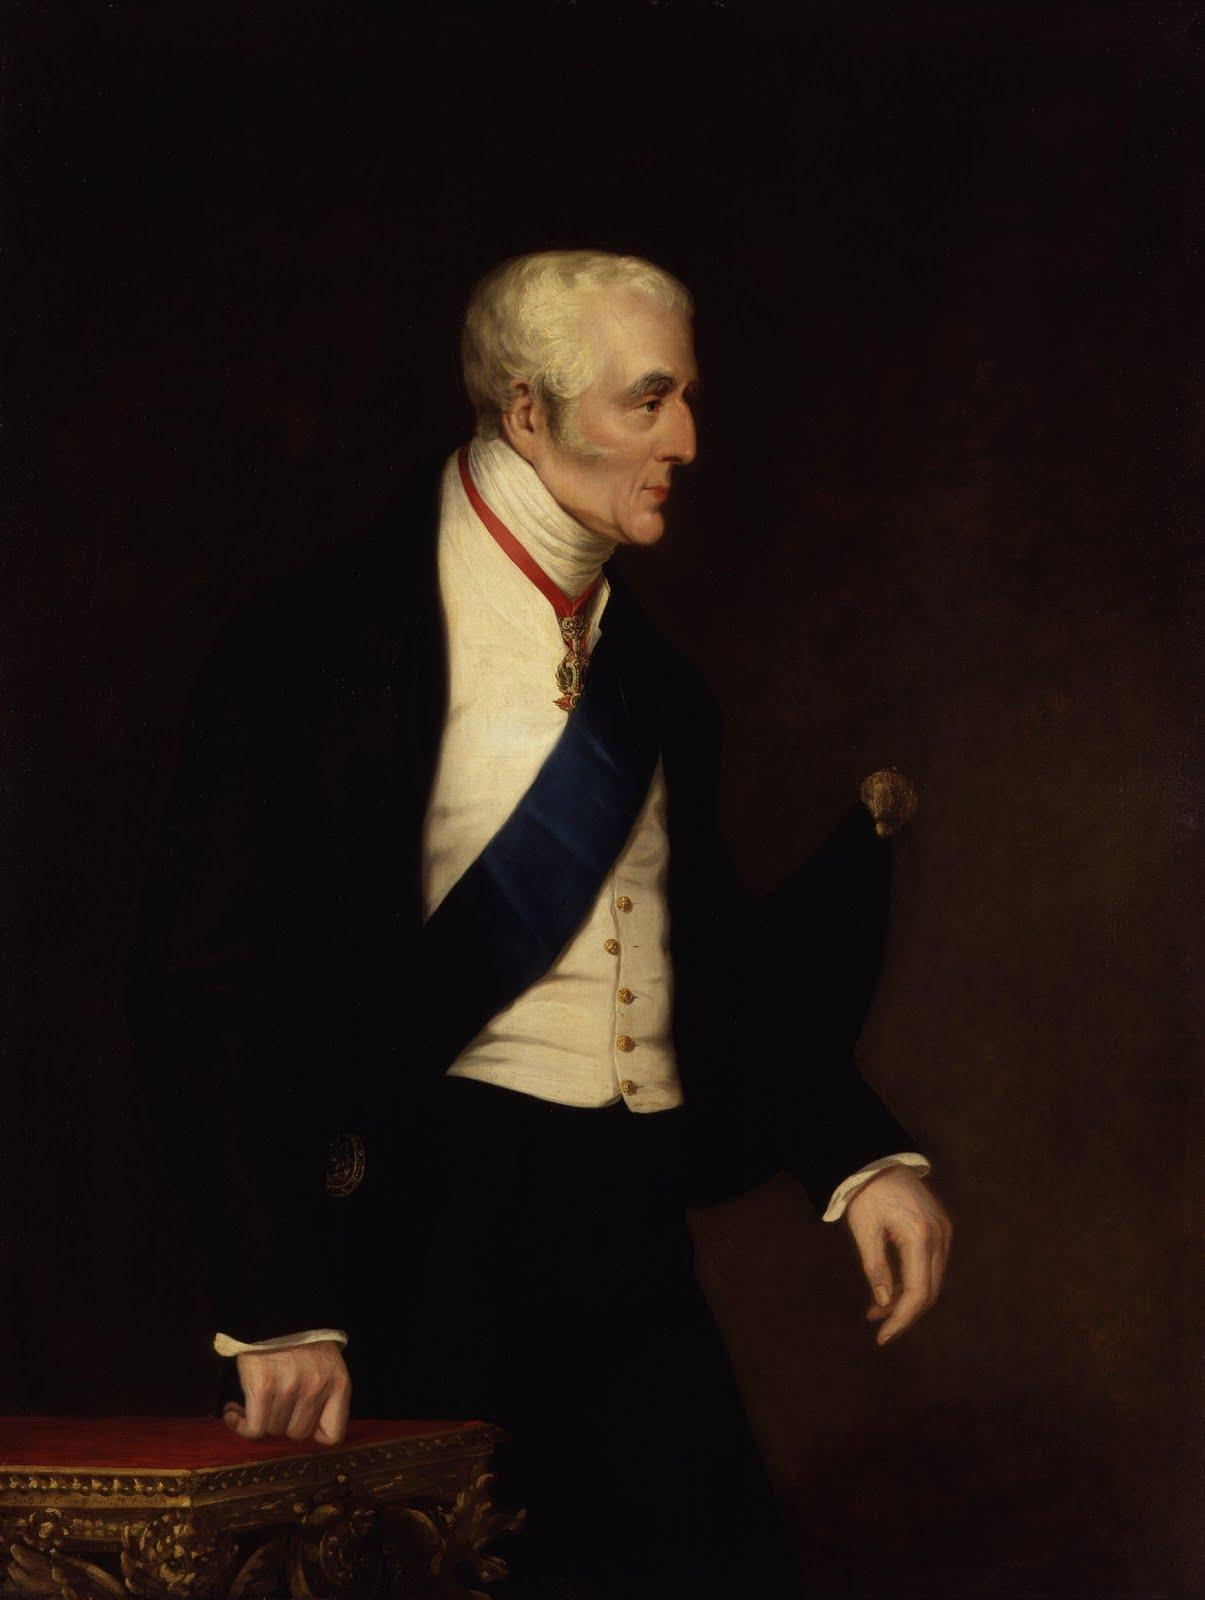 Duke of Wellington (title)